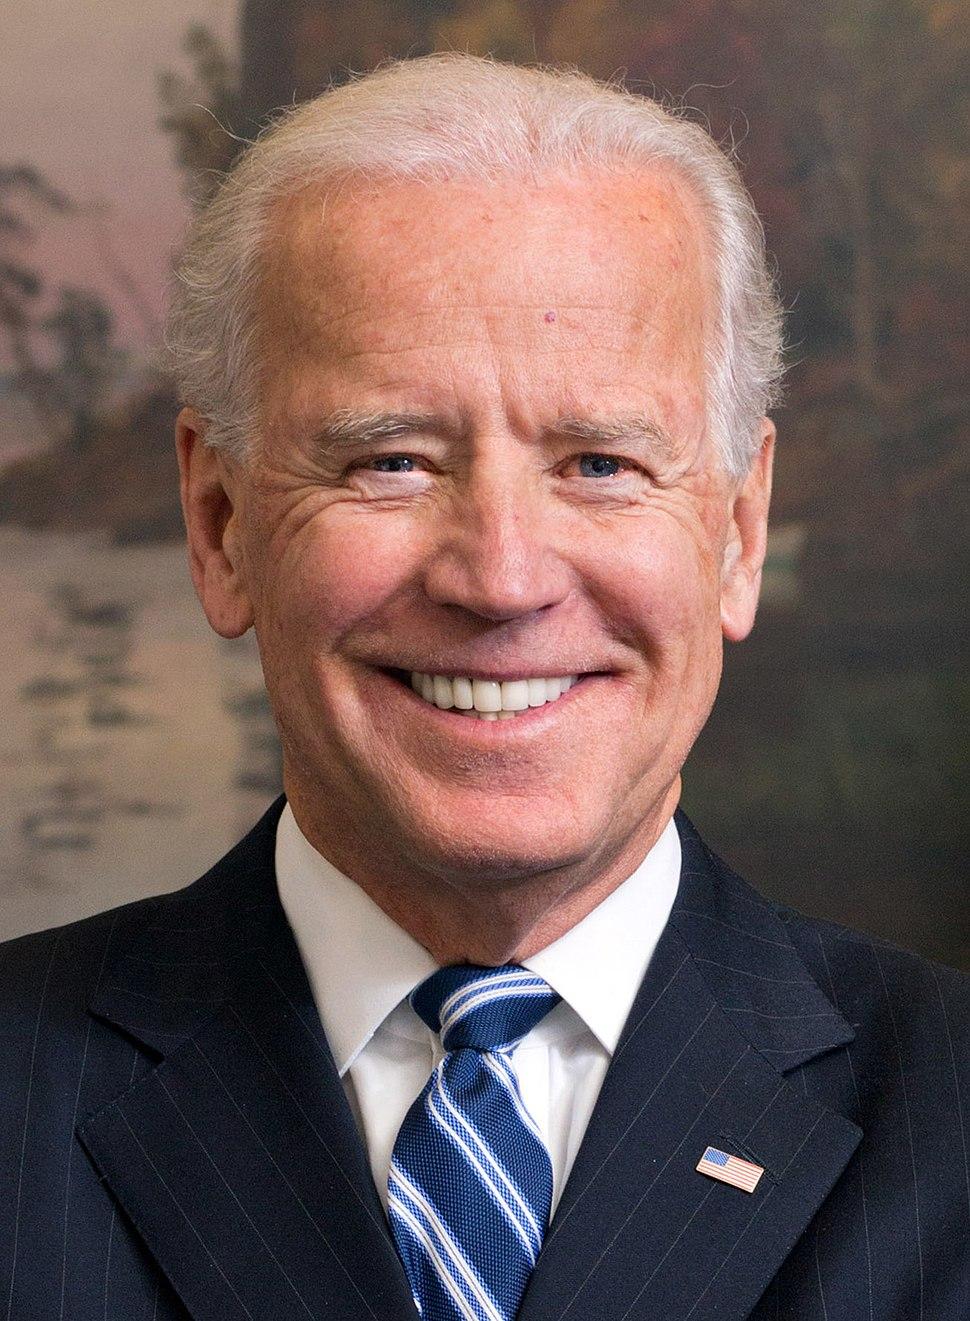 Joe Biden 2013